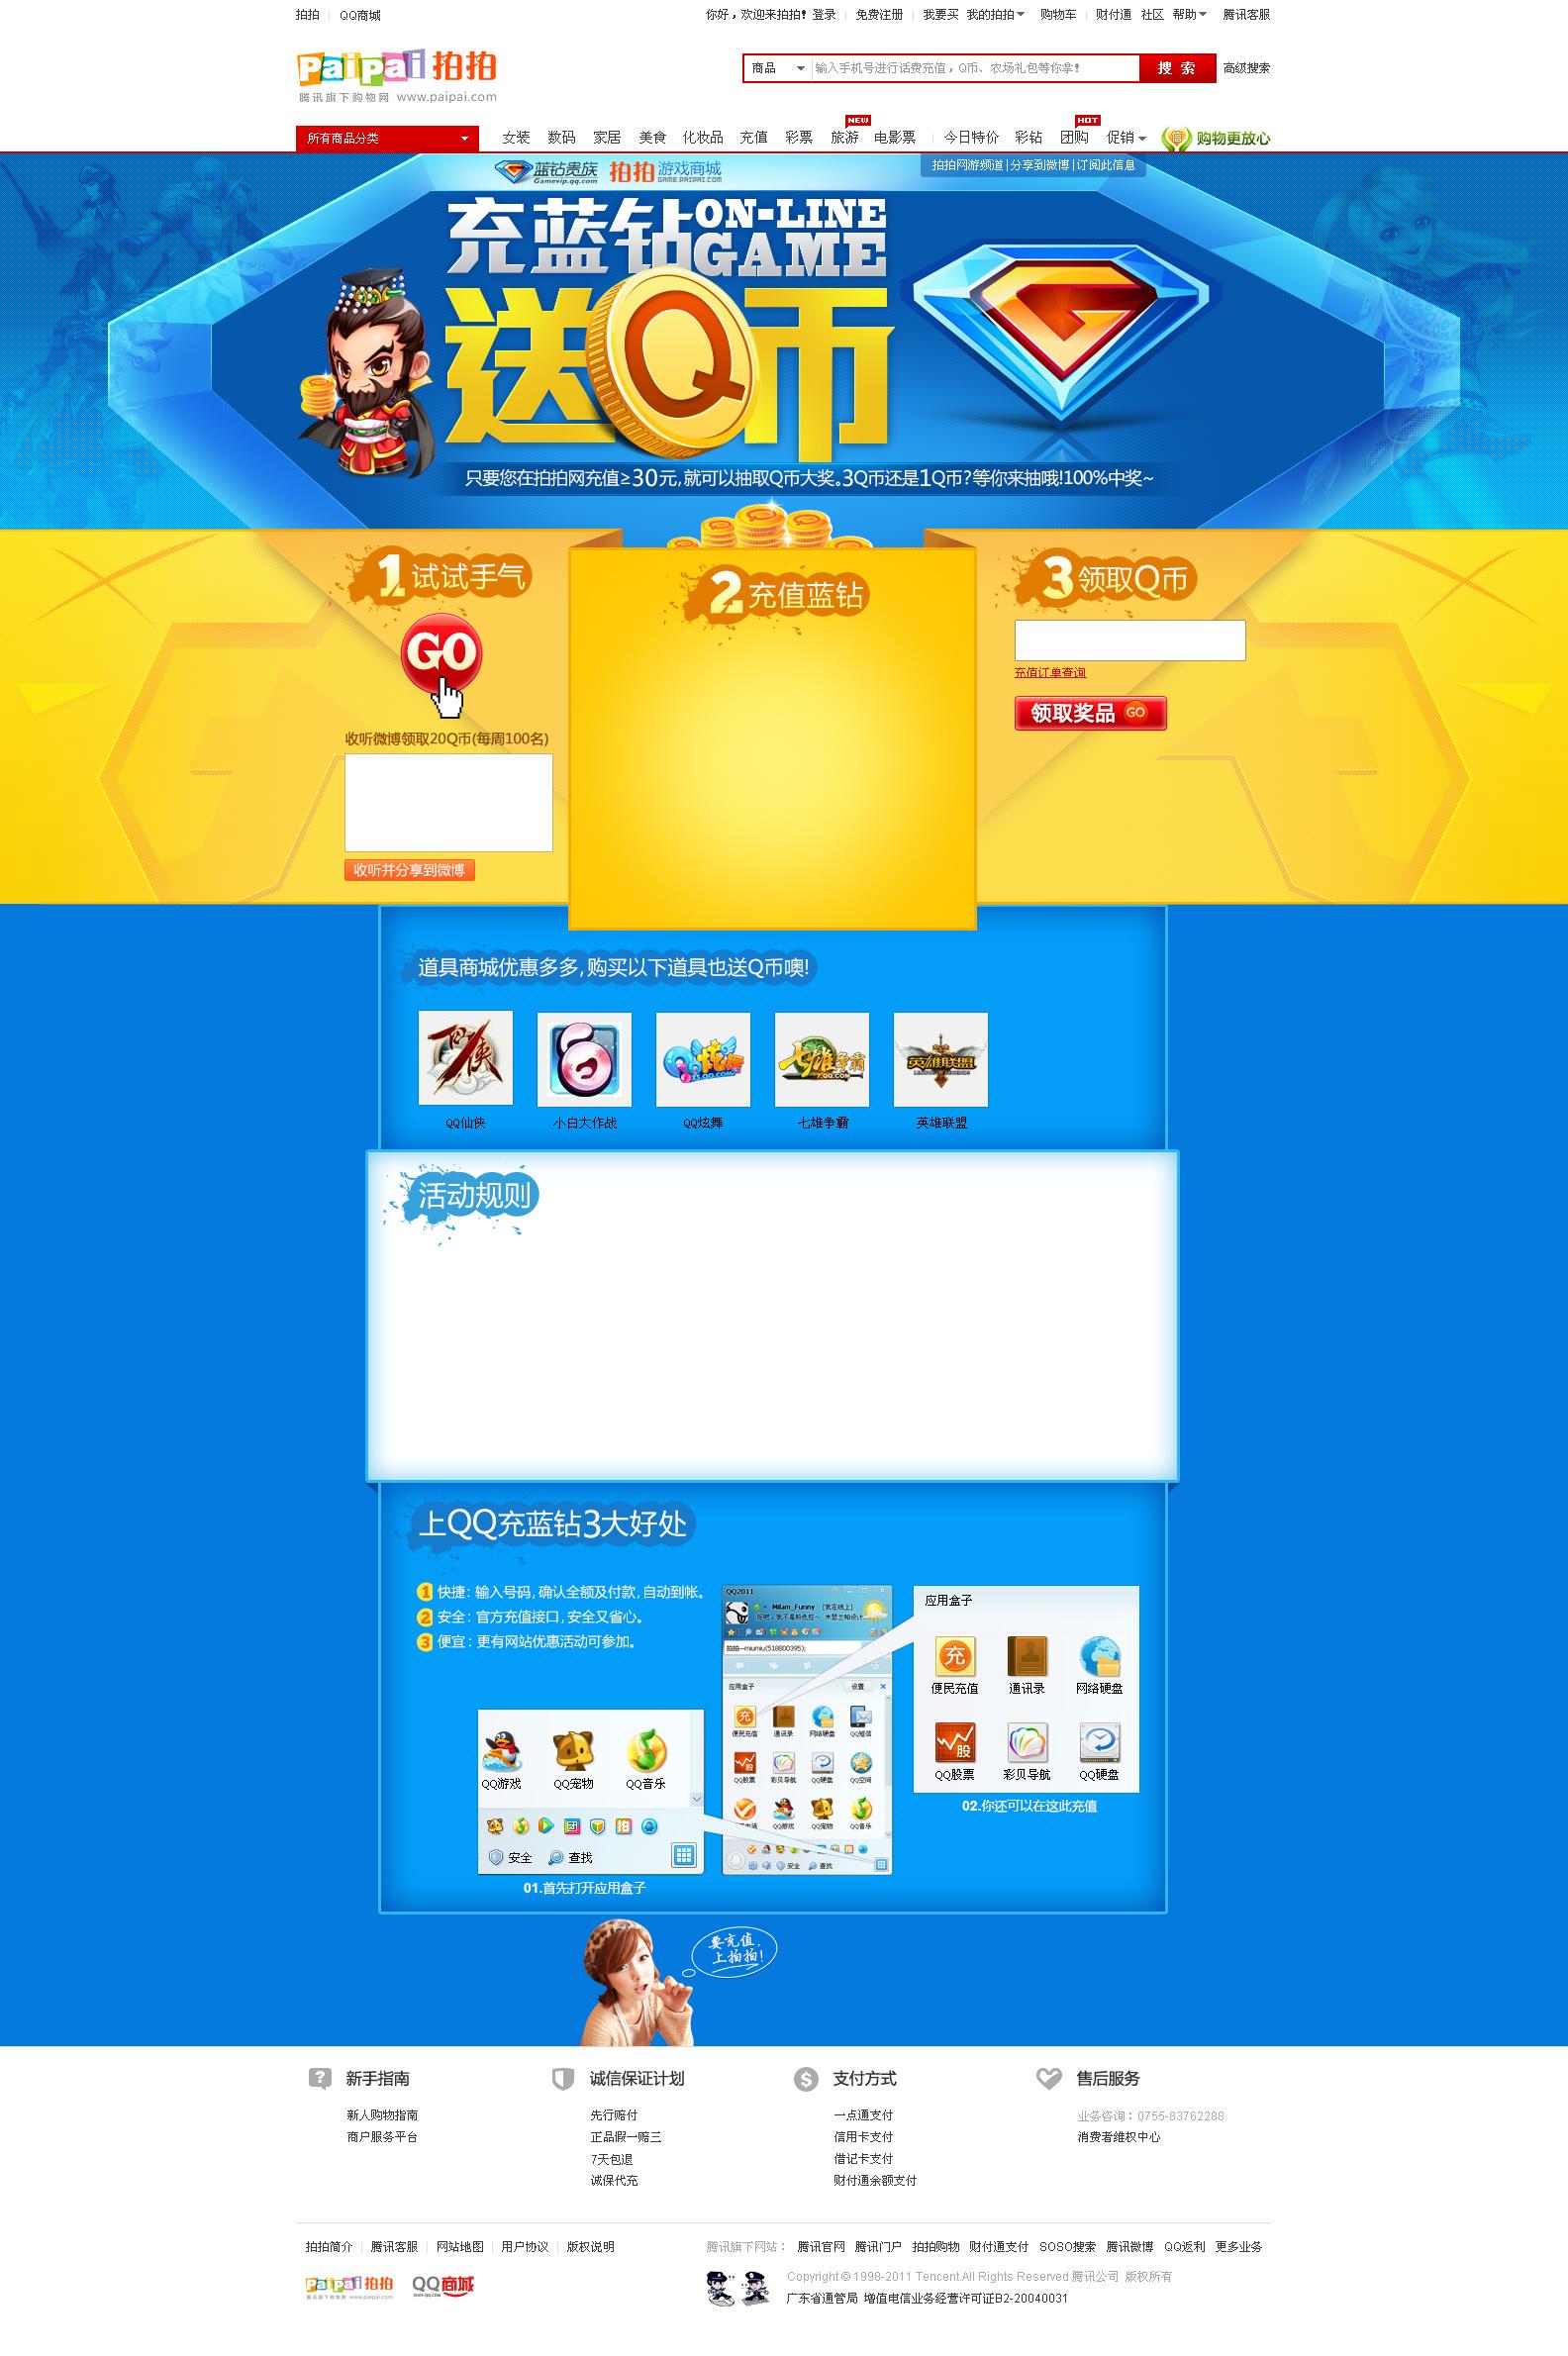 18luck. com来源: 新华社 作者: 18luck. com 18luck. com 18luck. com是国内最好的网页游戏平台,好玩的网页游戏排行榜每天更新,为您提供更多的新力18luckcool,更有18luck 新利,.